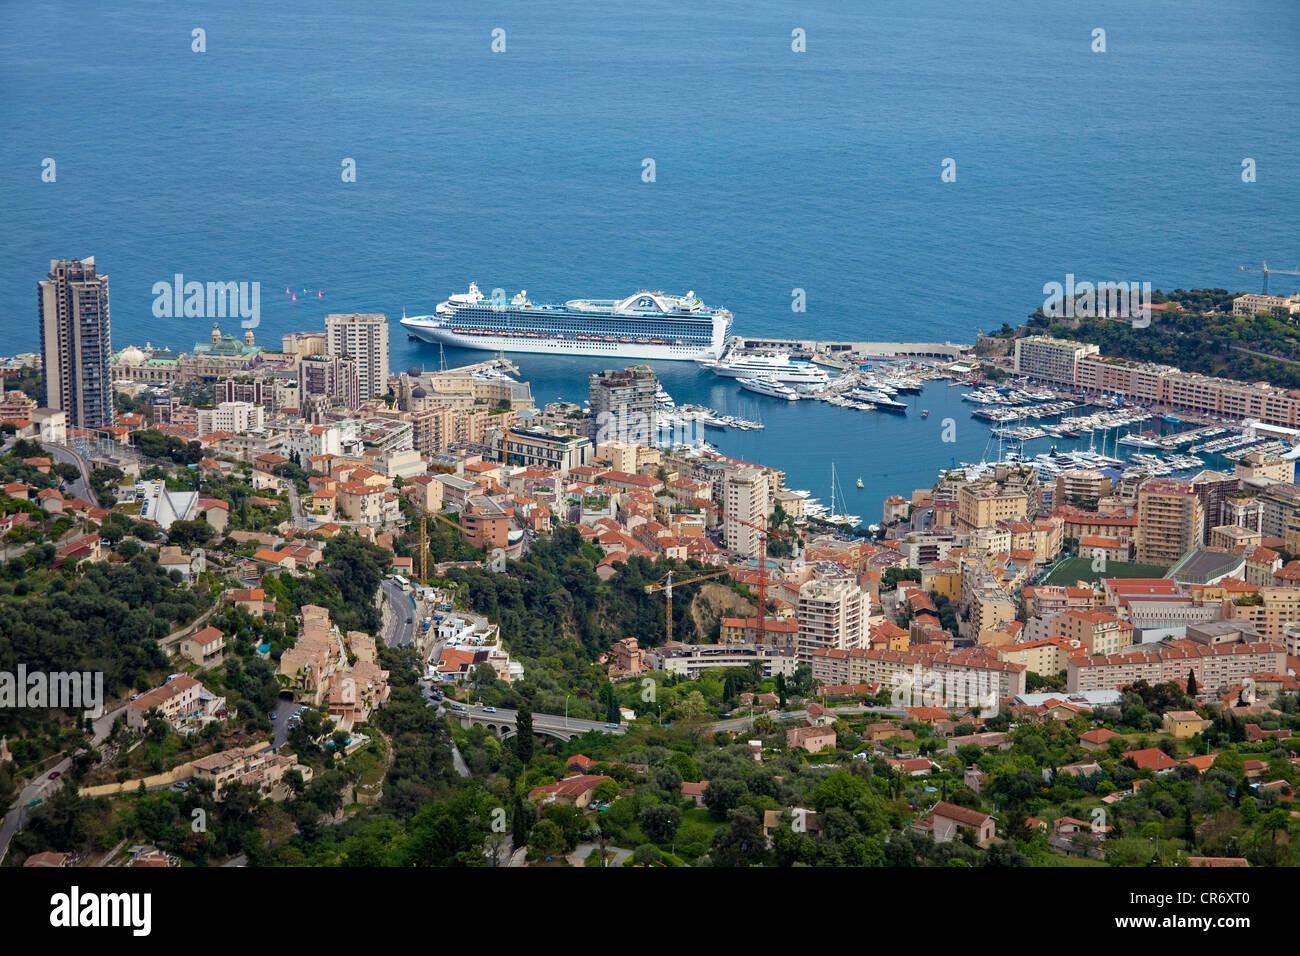 View of the Principality of Monaco, Europe - Stock Image